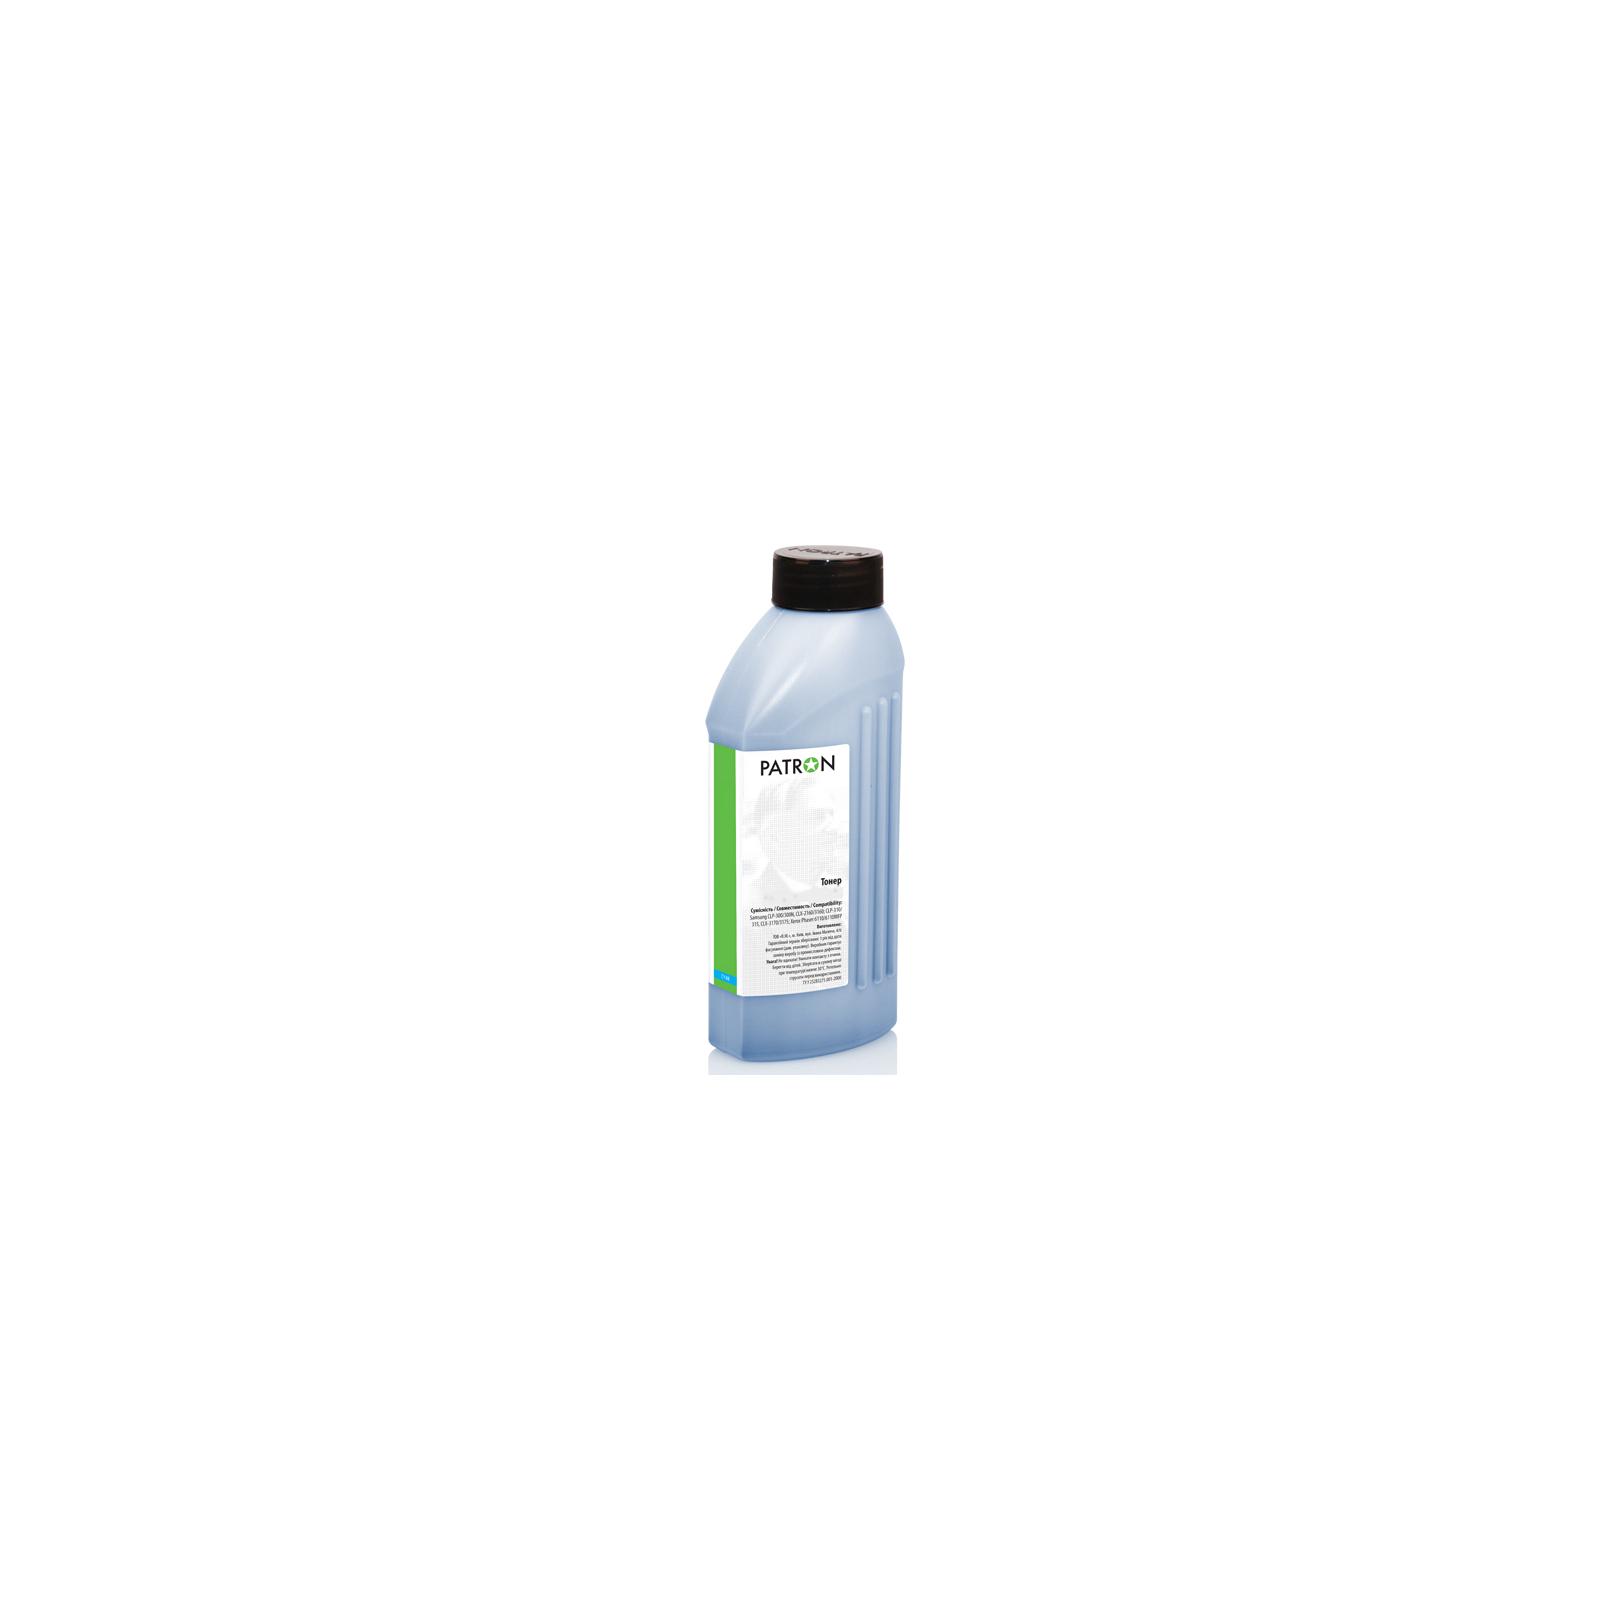 Тонер PATRON HP CLJ Pro CP1025 COLOR CYAN 30г (T-PN-HLJPCP1025CC030)